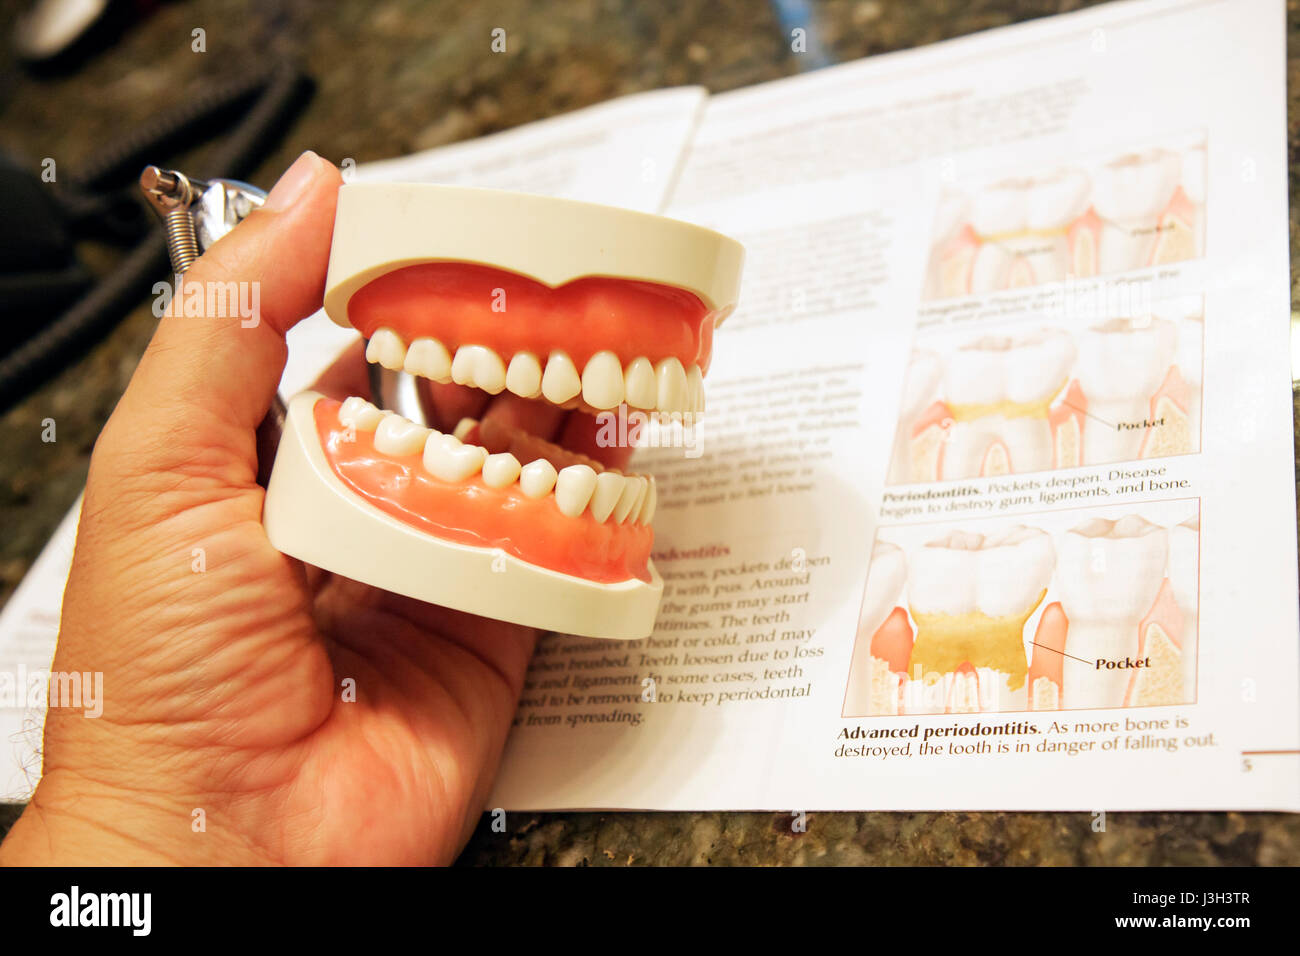 Miami Florida periodontist's office teeth dental care model gums molars health dentistry periodontitis illustrations - Stock Image